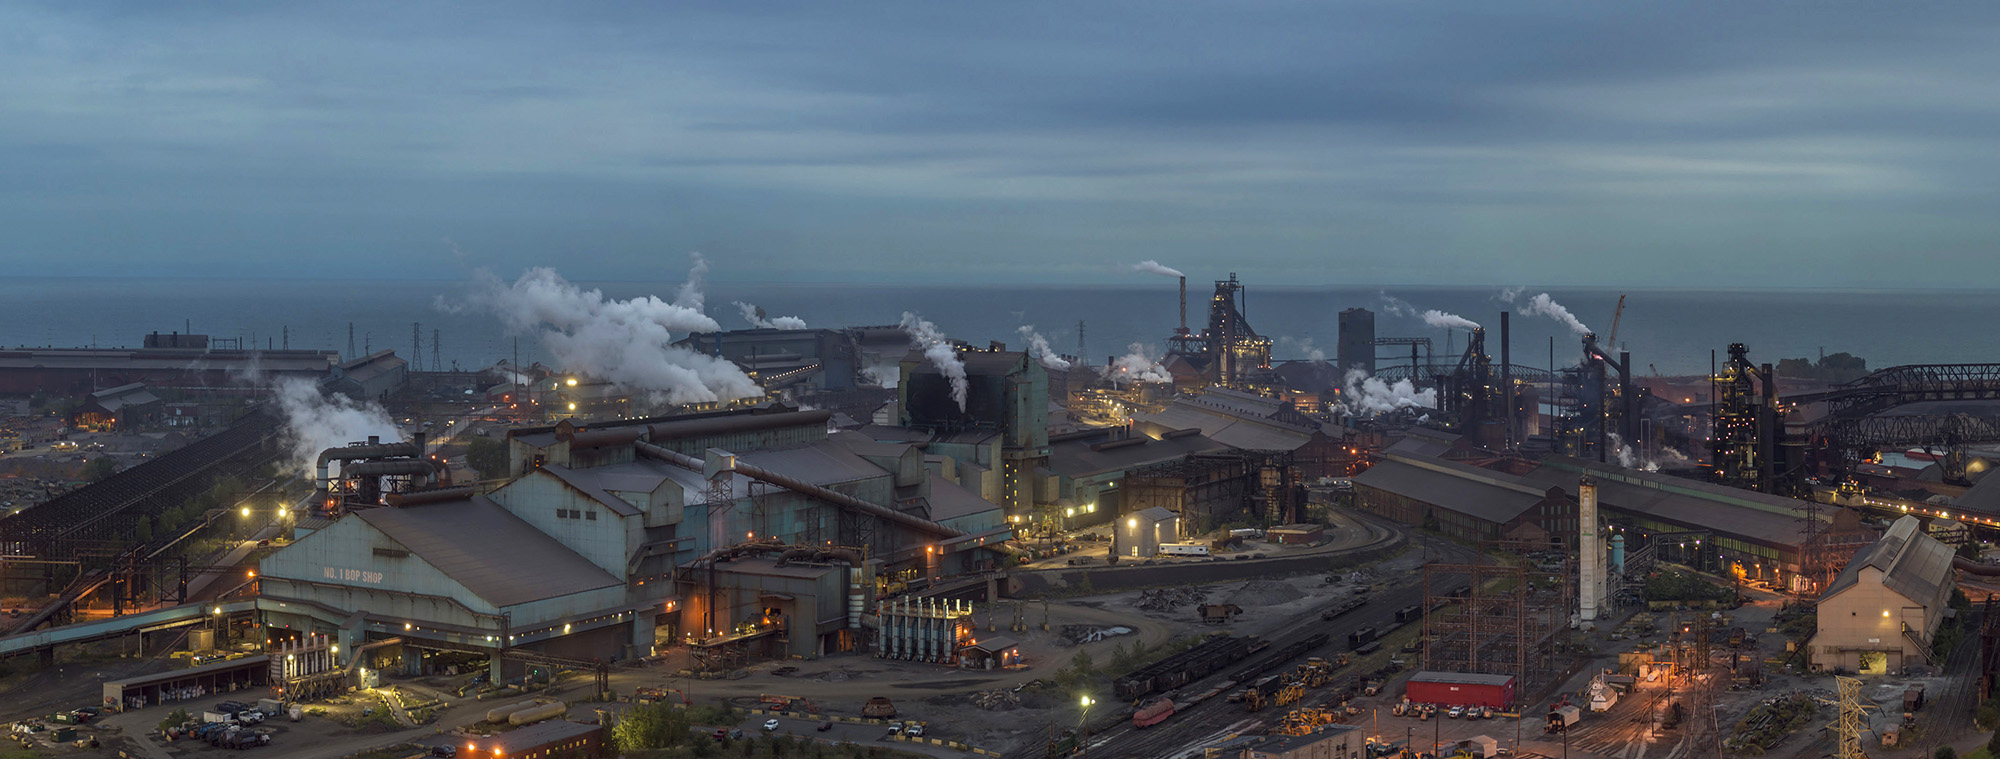 009_Peter_Essick-Steel_Mill_Lake_MIchigan_Gary_Indiana.jpg